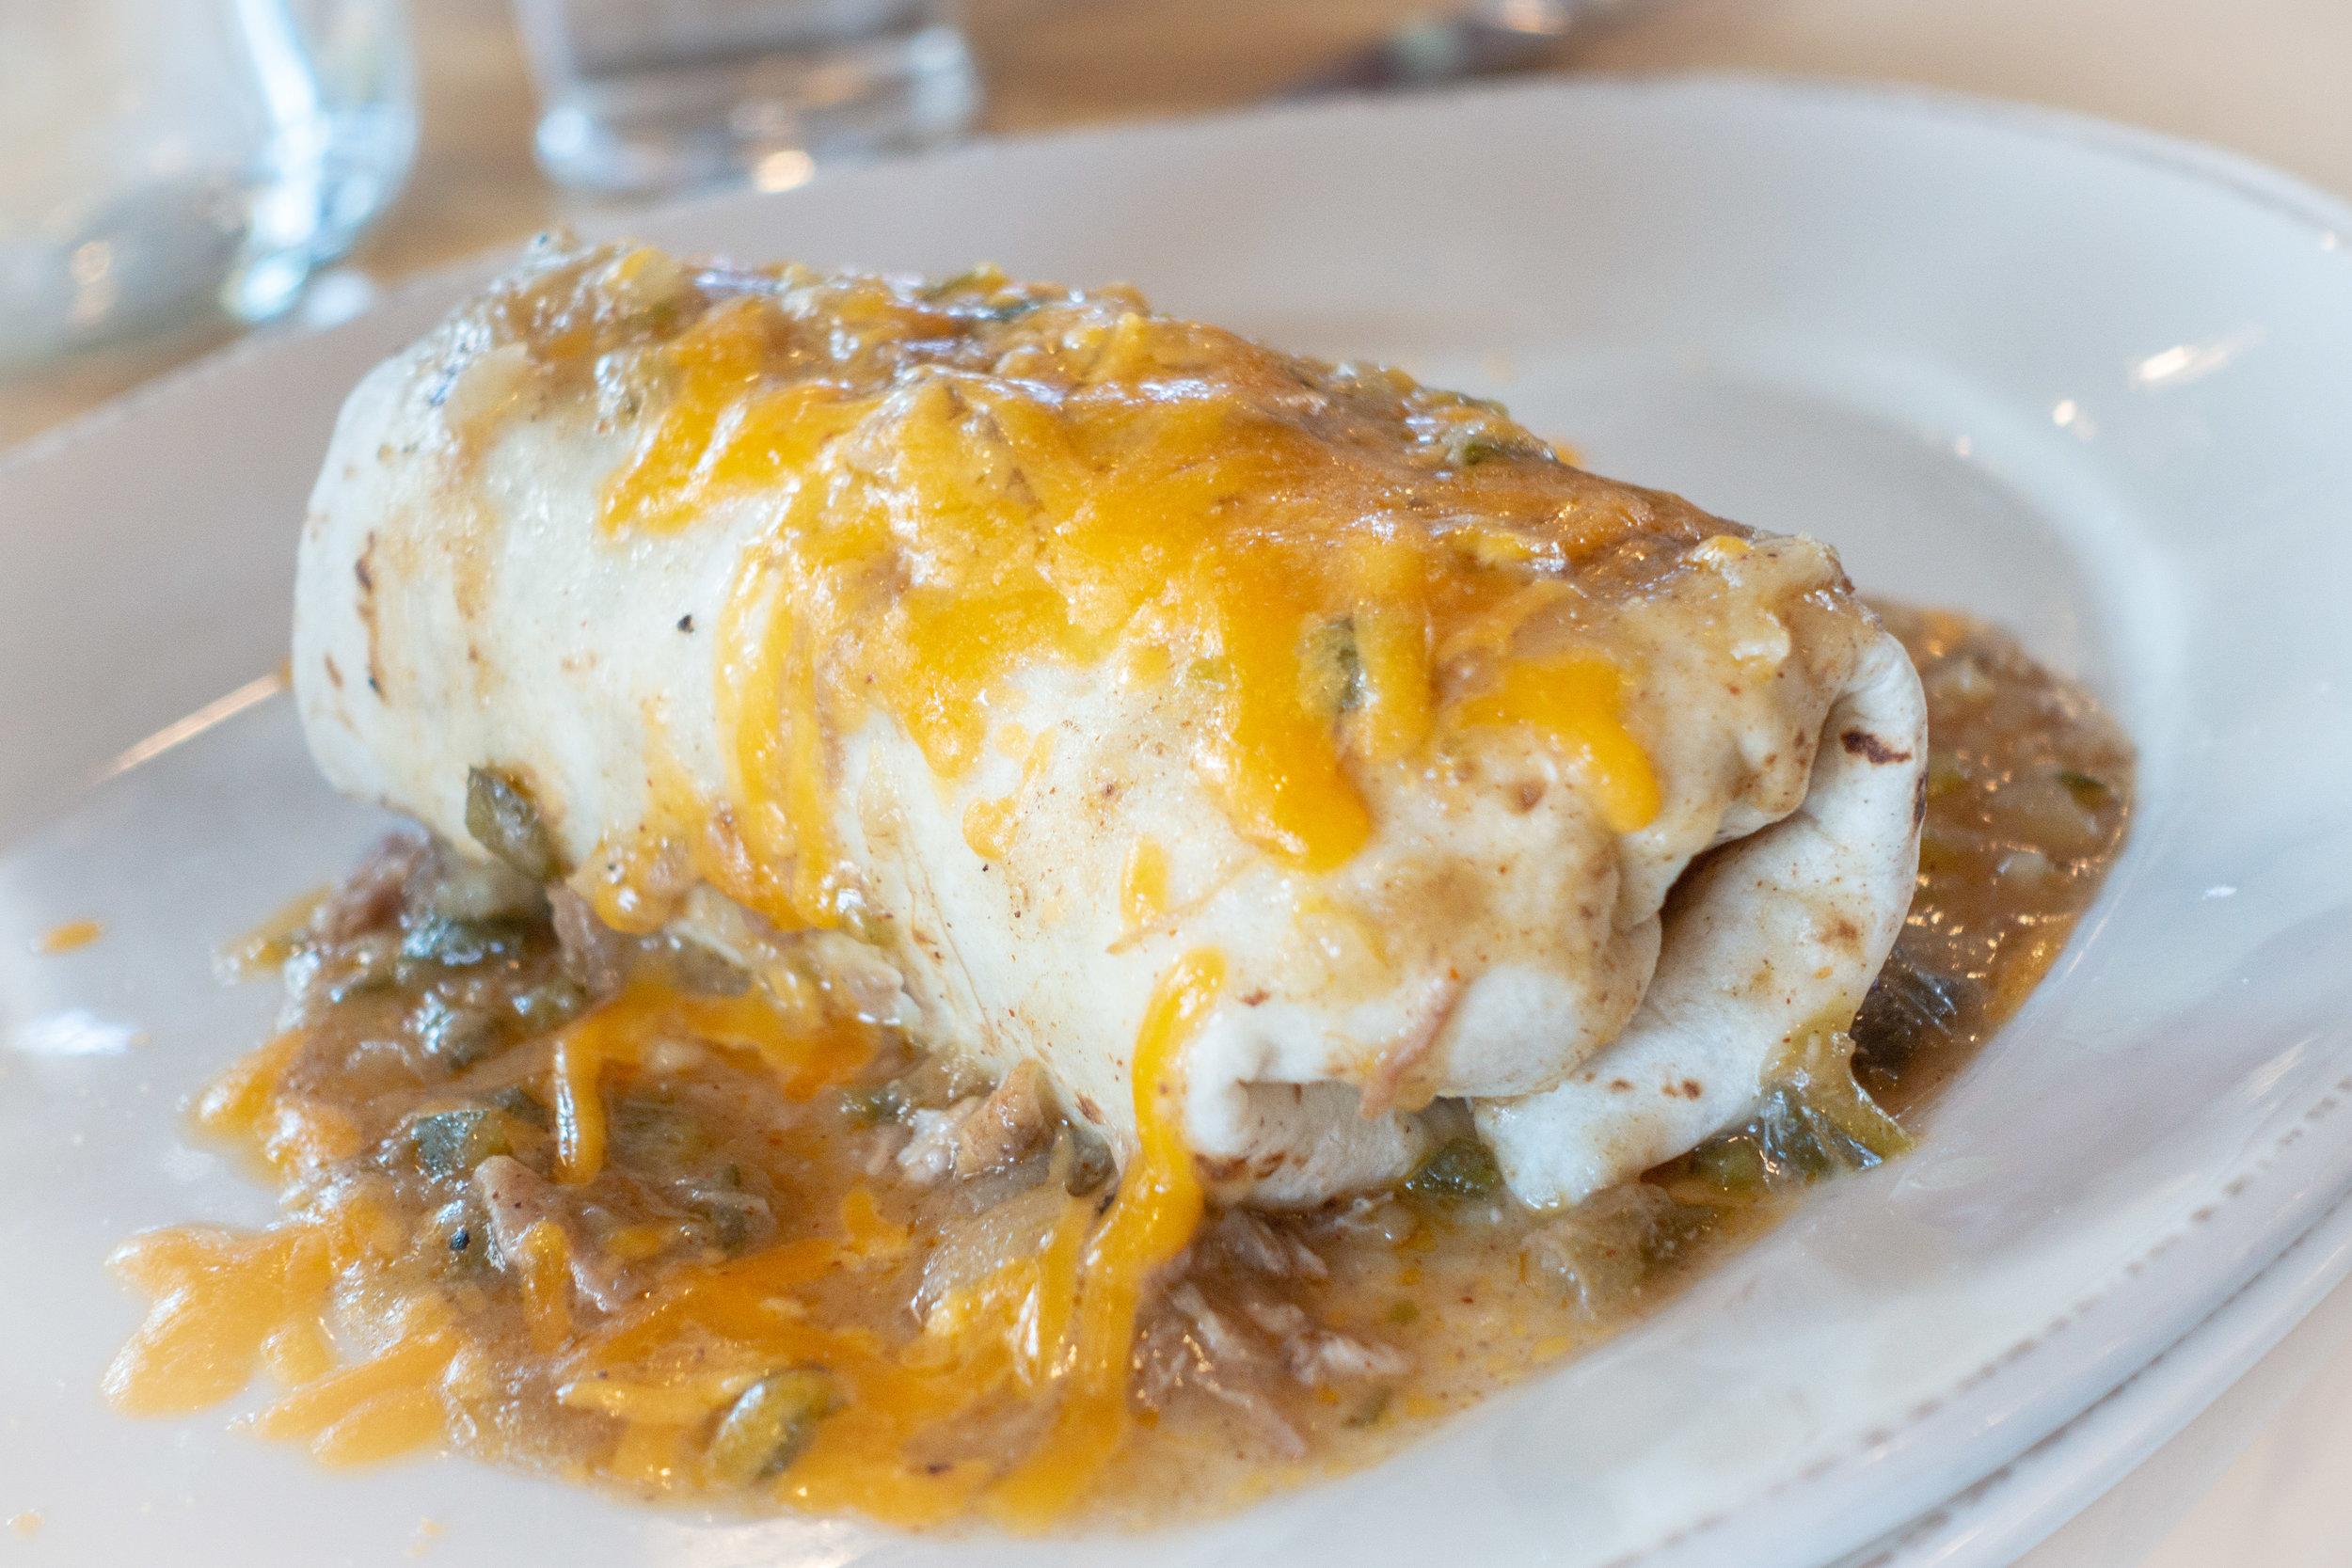 Deer Mountain Breakfast Burrito